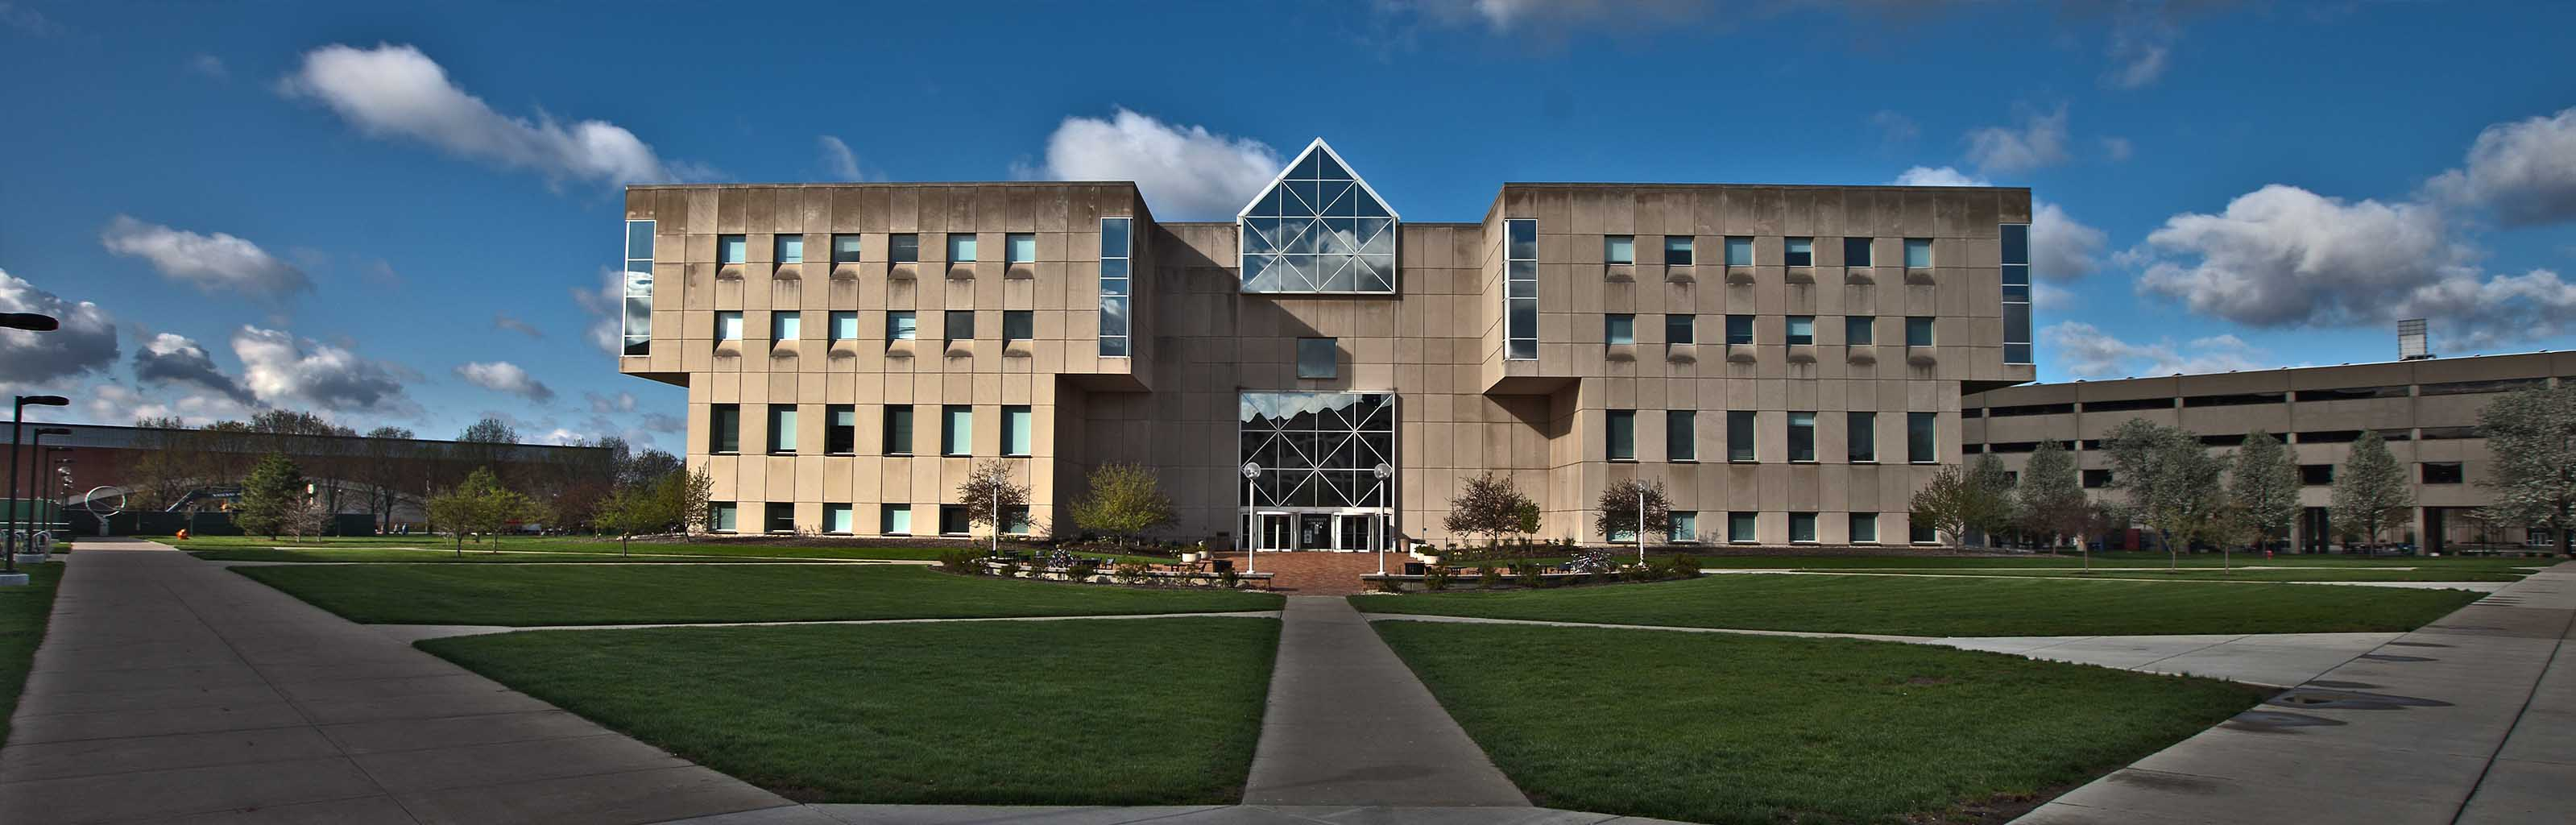 iupui-university-library